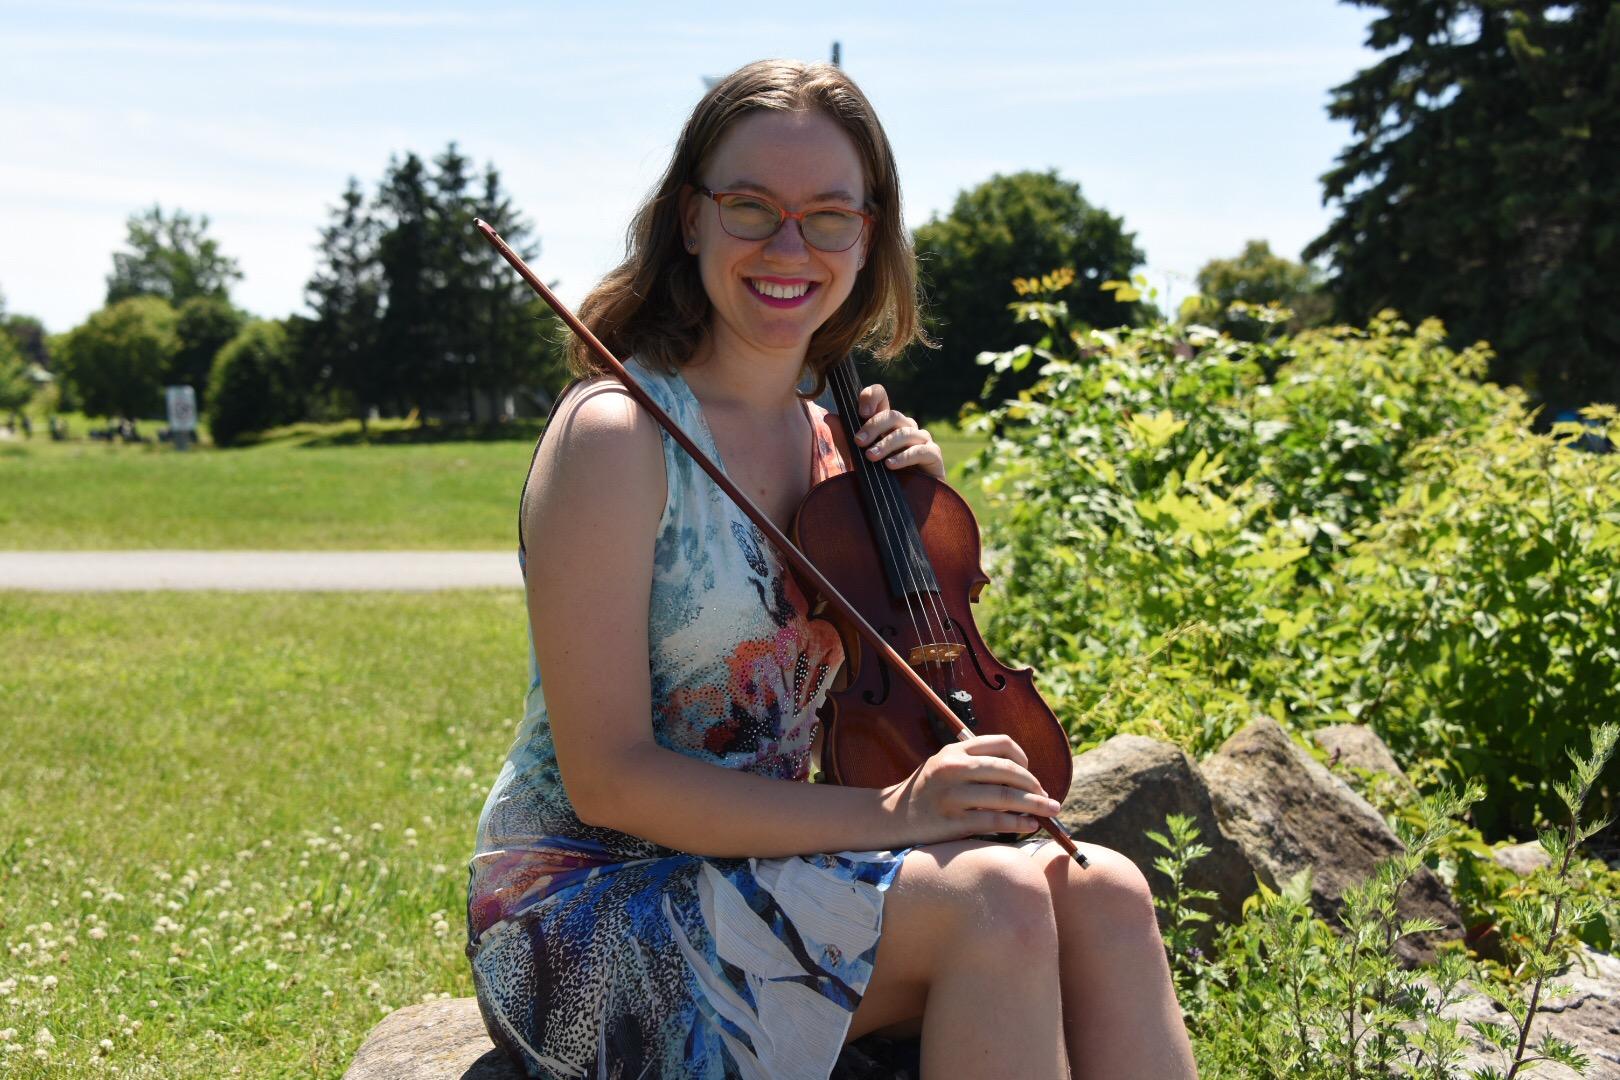 Image of Victoria Goodman with violin